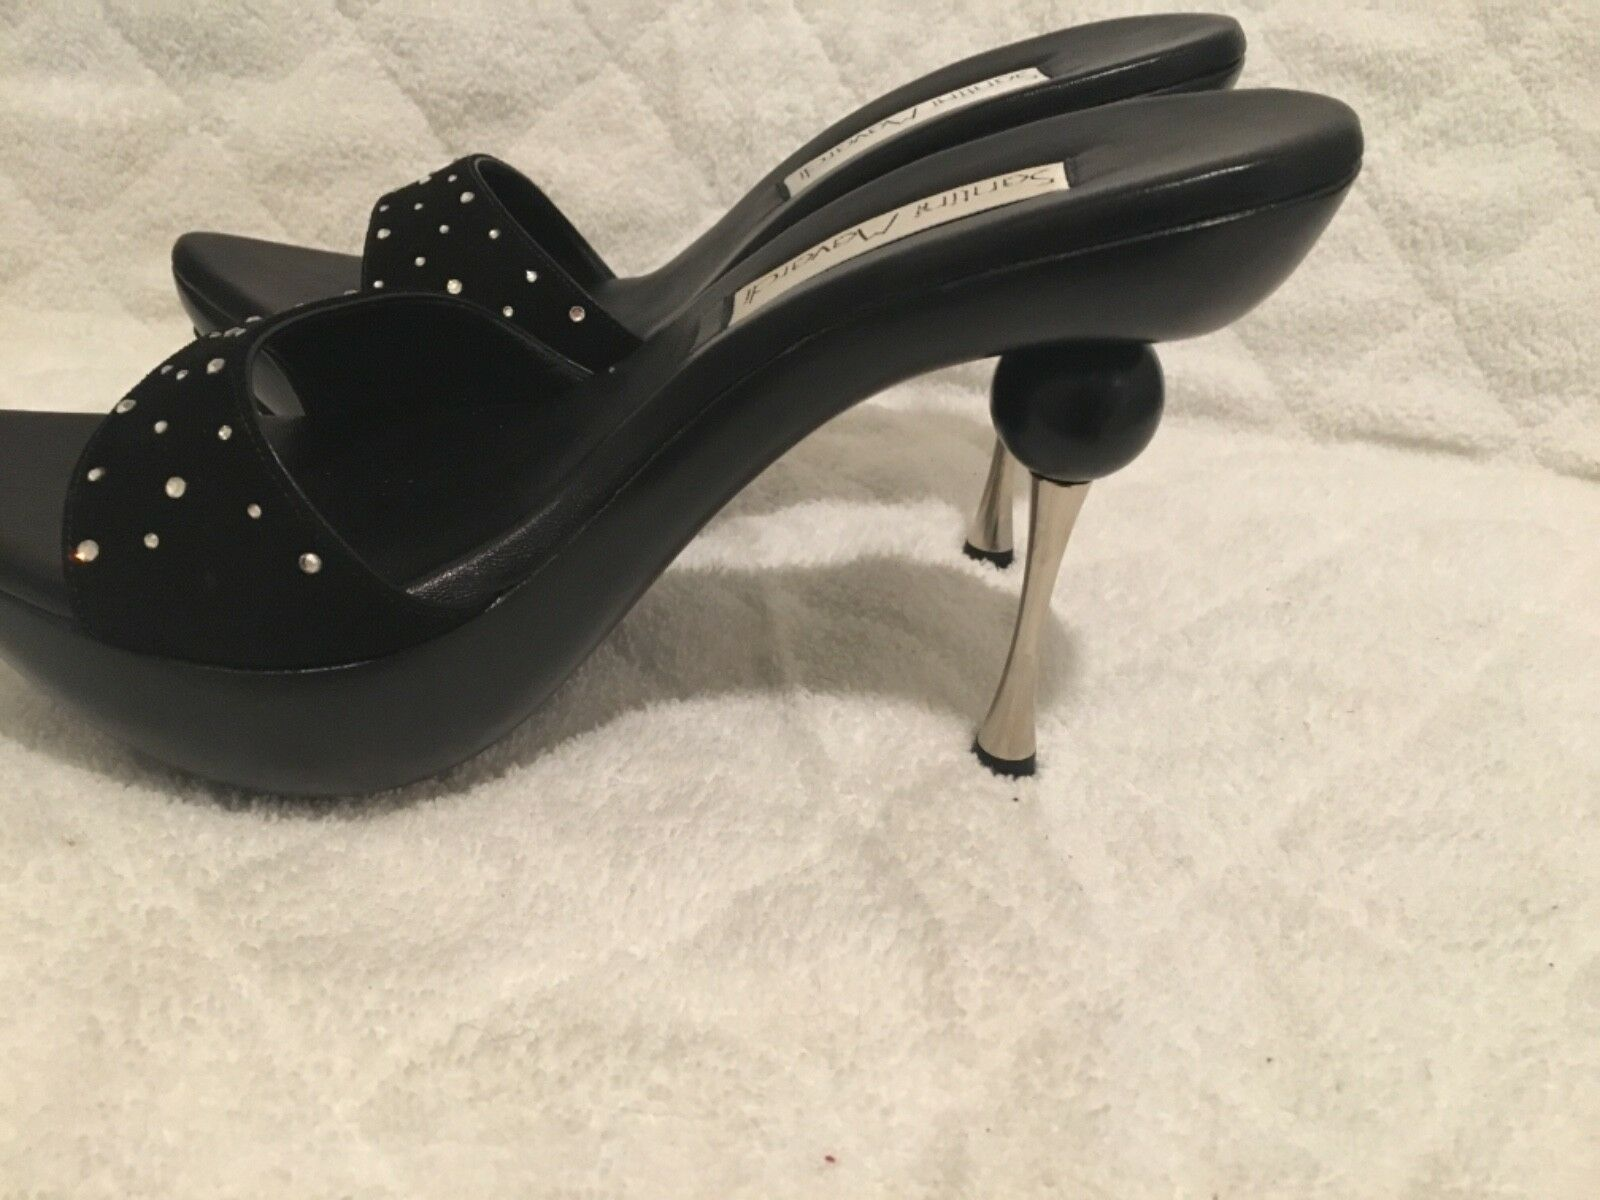 NW MAVARDI HIGH HEEL noir SUEDE SPlASH SPlASH SPlASH CRYSTA SANDLE 495 WITH BOX SZ9 chaussures 011caf